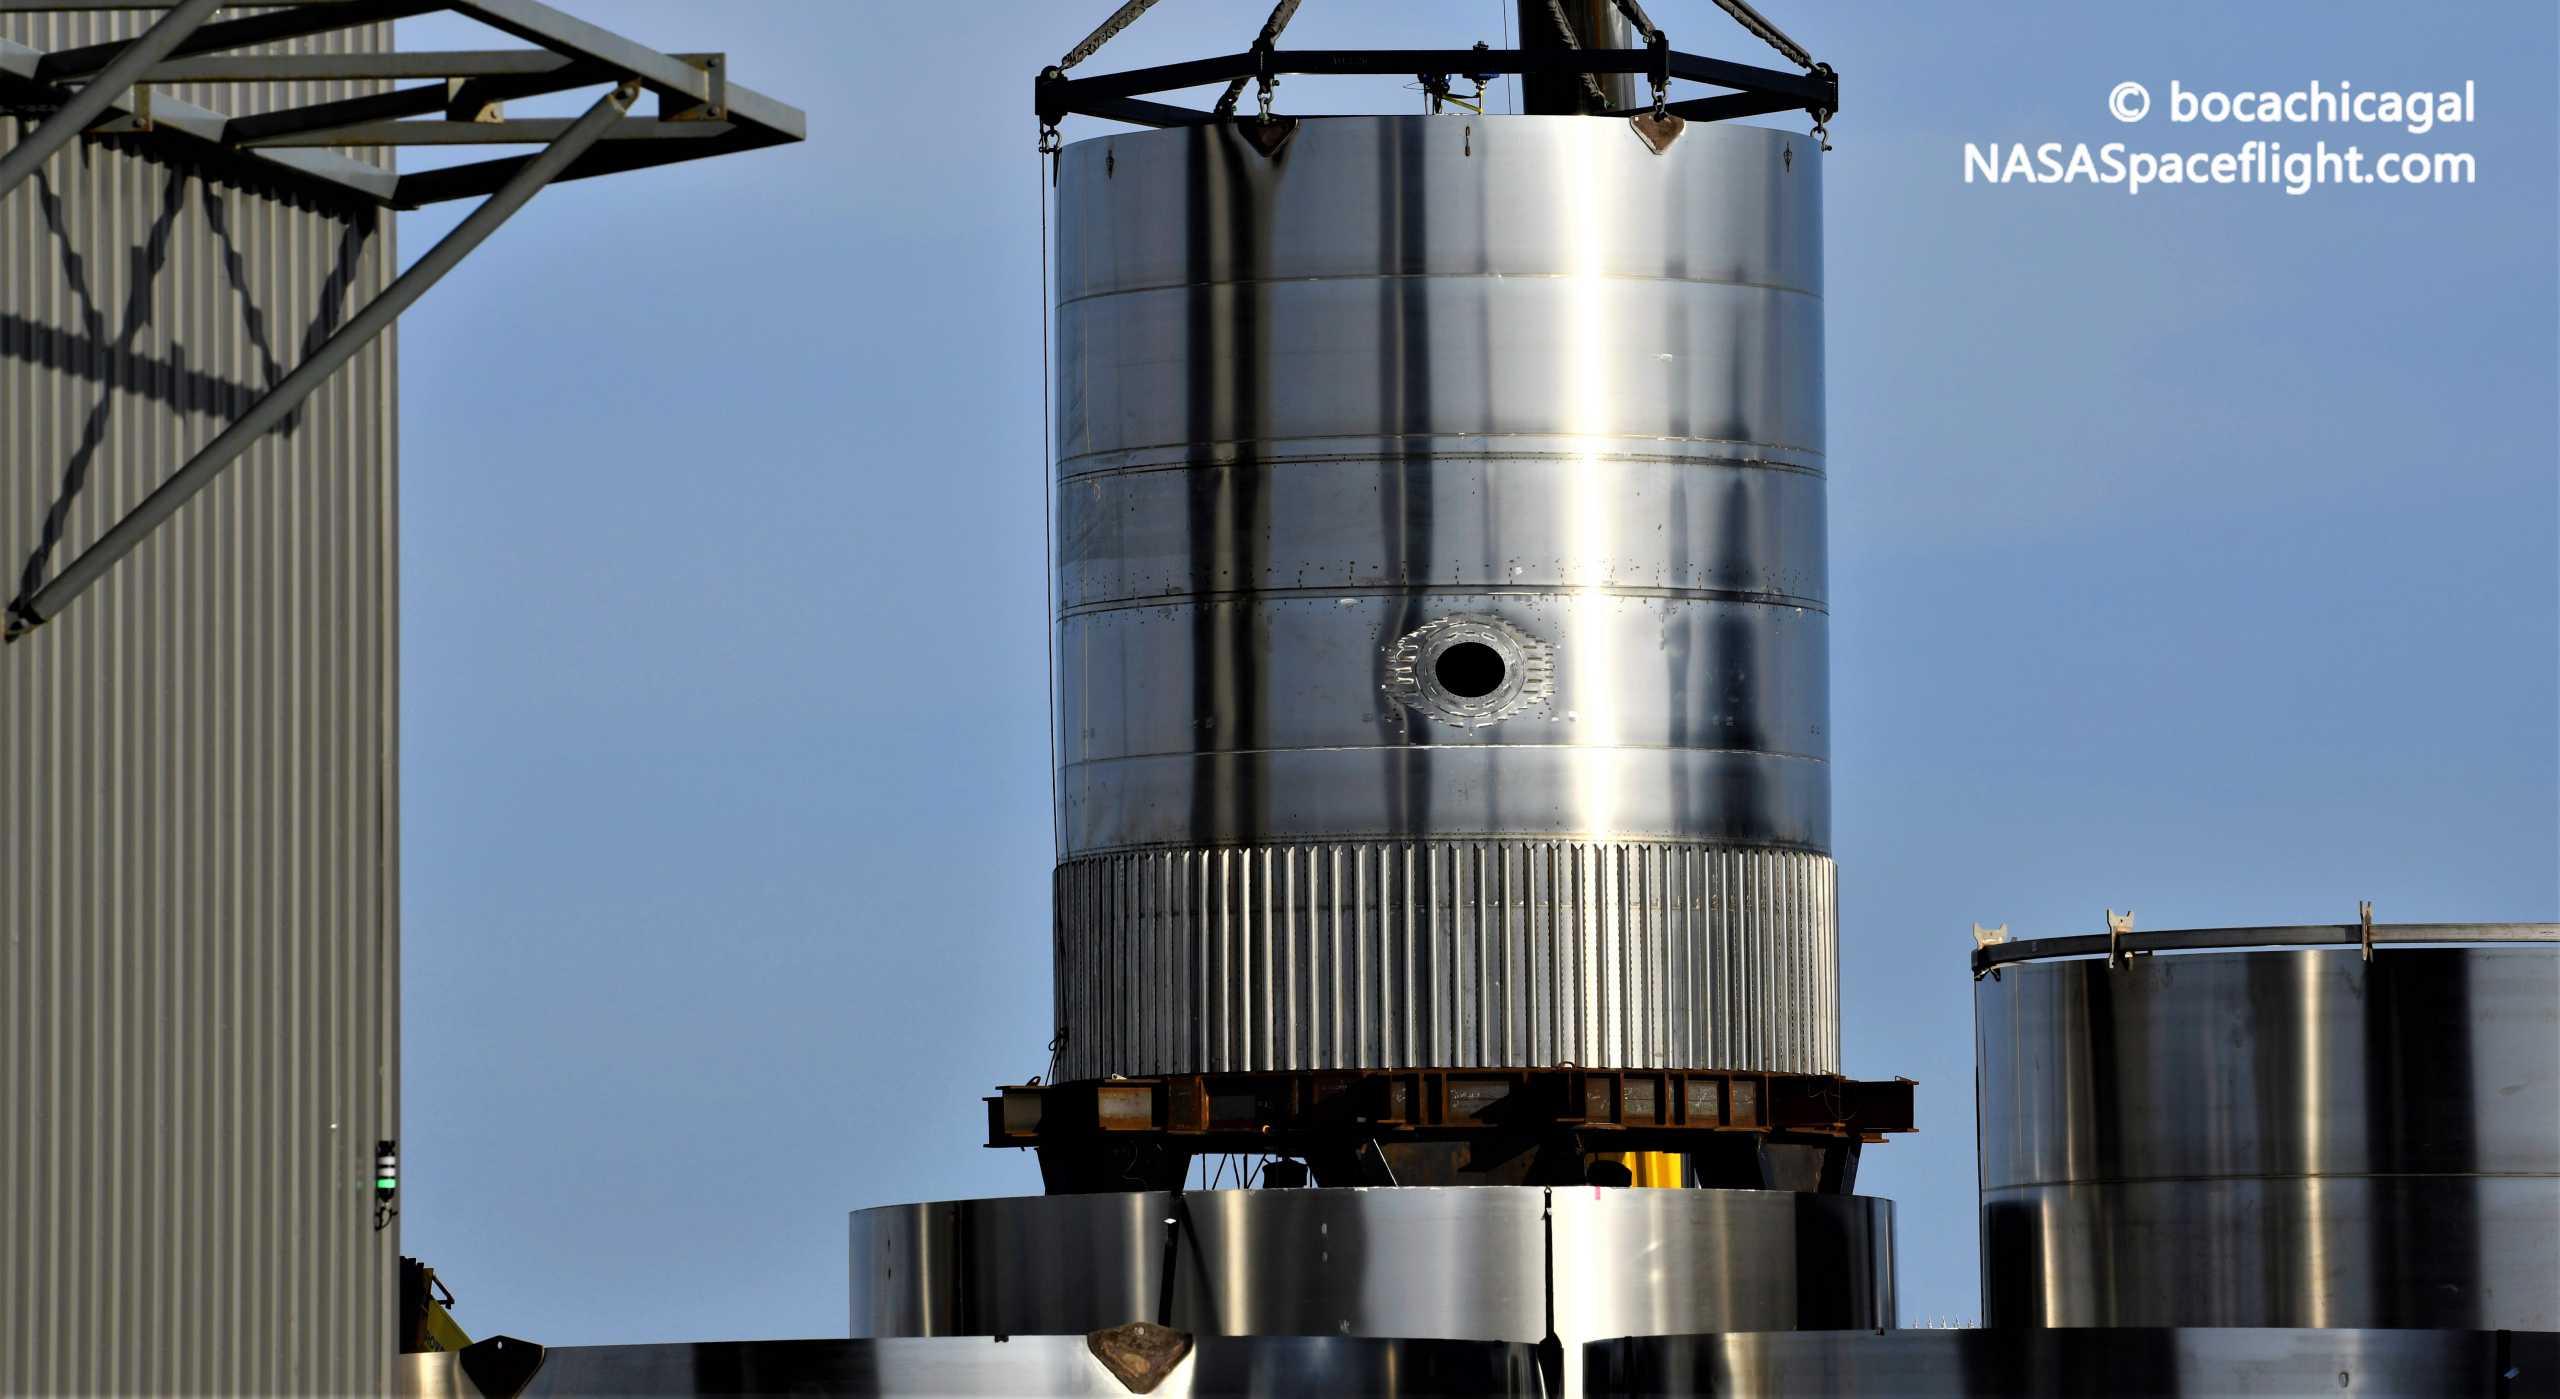 Starship Boca Chica 053121 (NASASpaceflight – bocachicagal) BN2.1 booster test tank 1 crop (c)